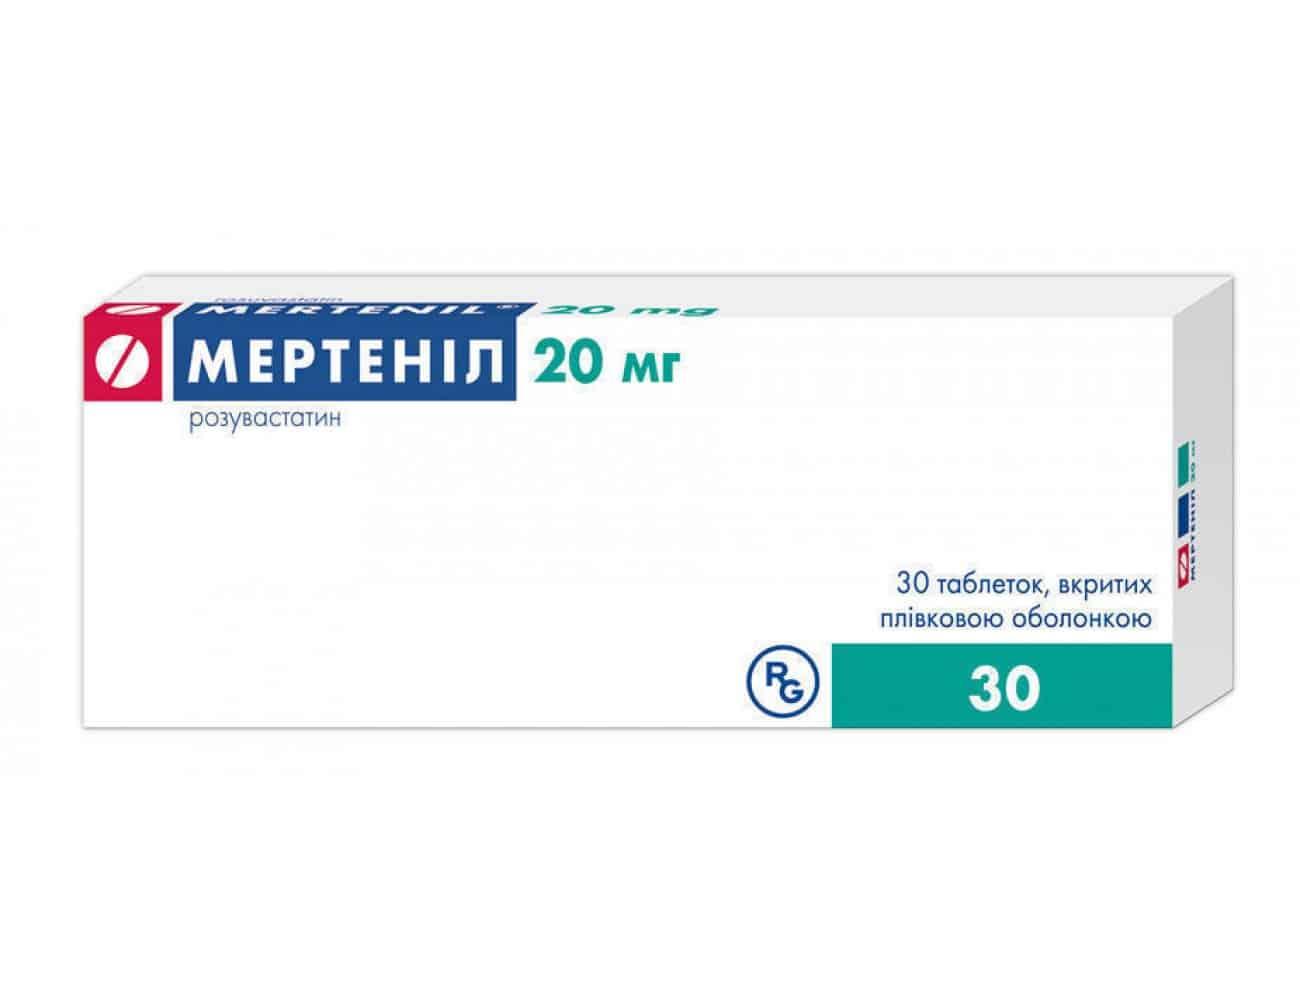 Mertenil (rosuvastatin) coated tablets 20 mg. №30